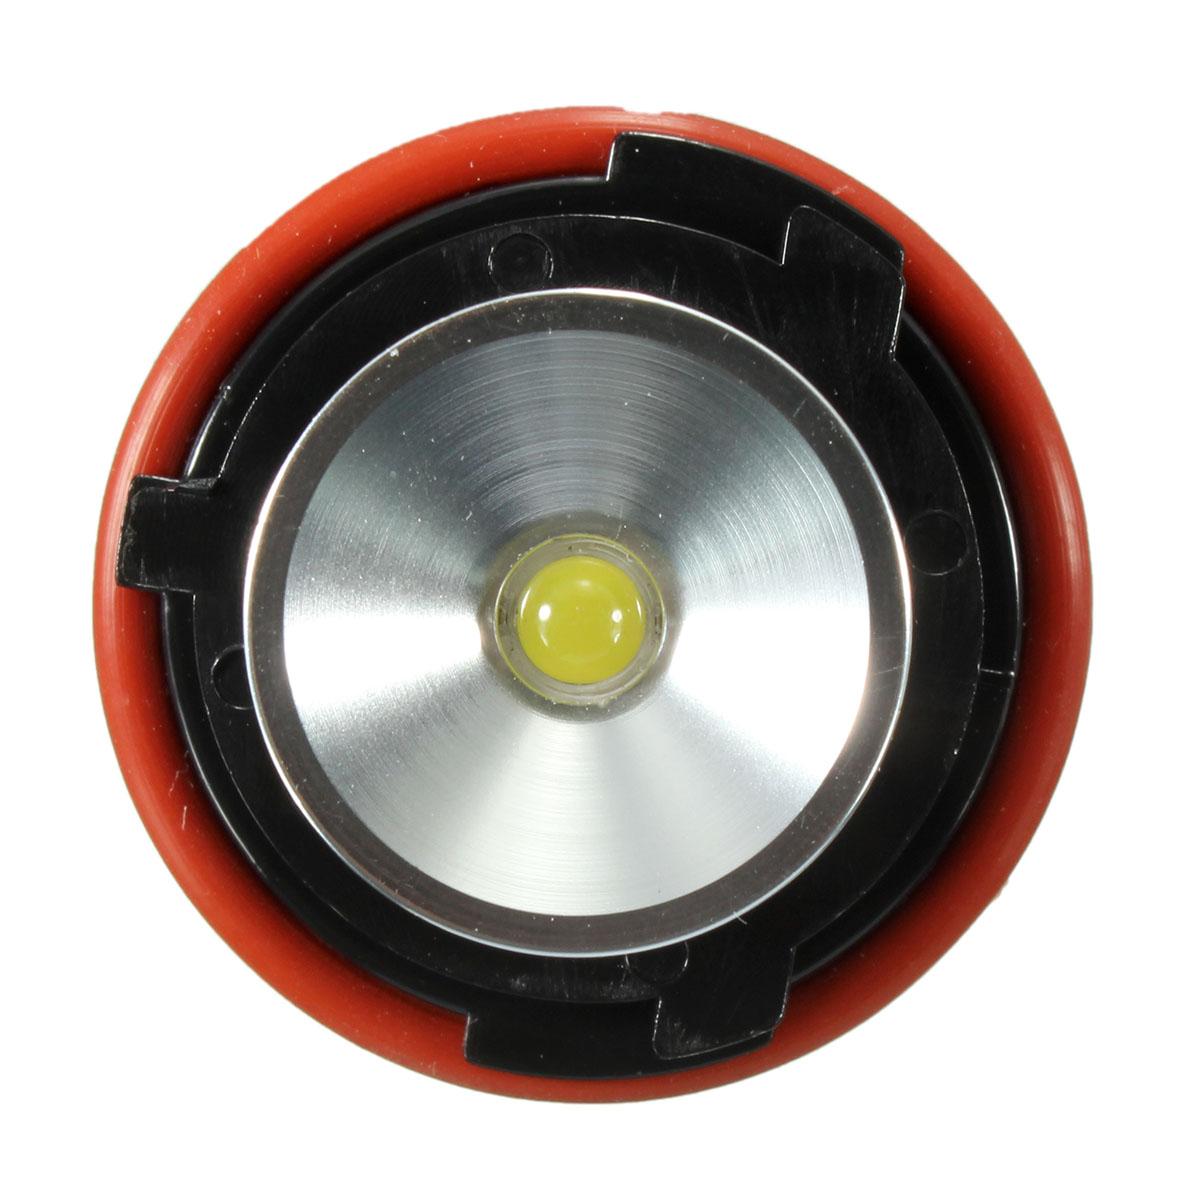 Led White Angel Eye Halo Light Bulb 5w For Bmw E39 E60 E63